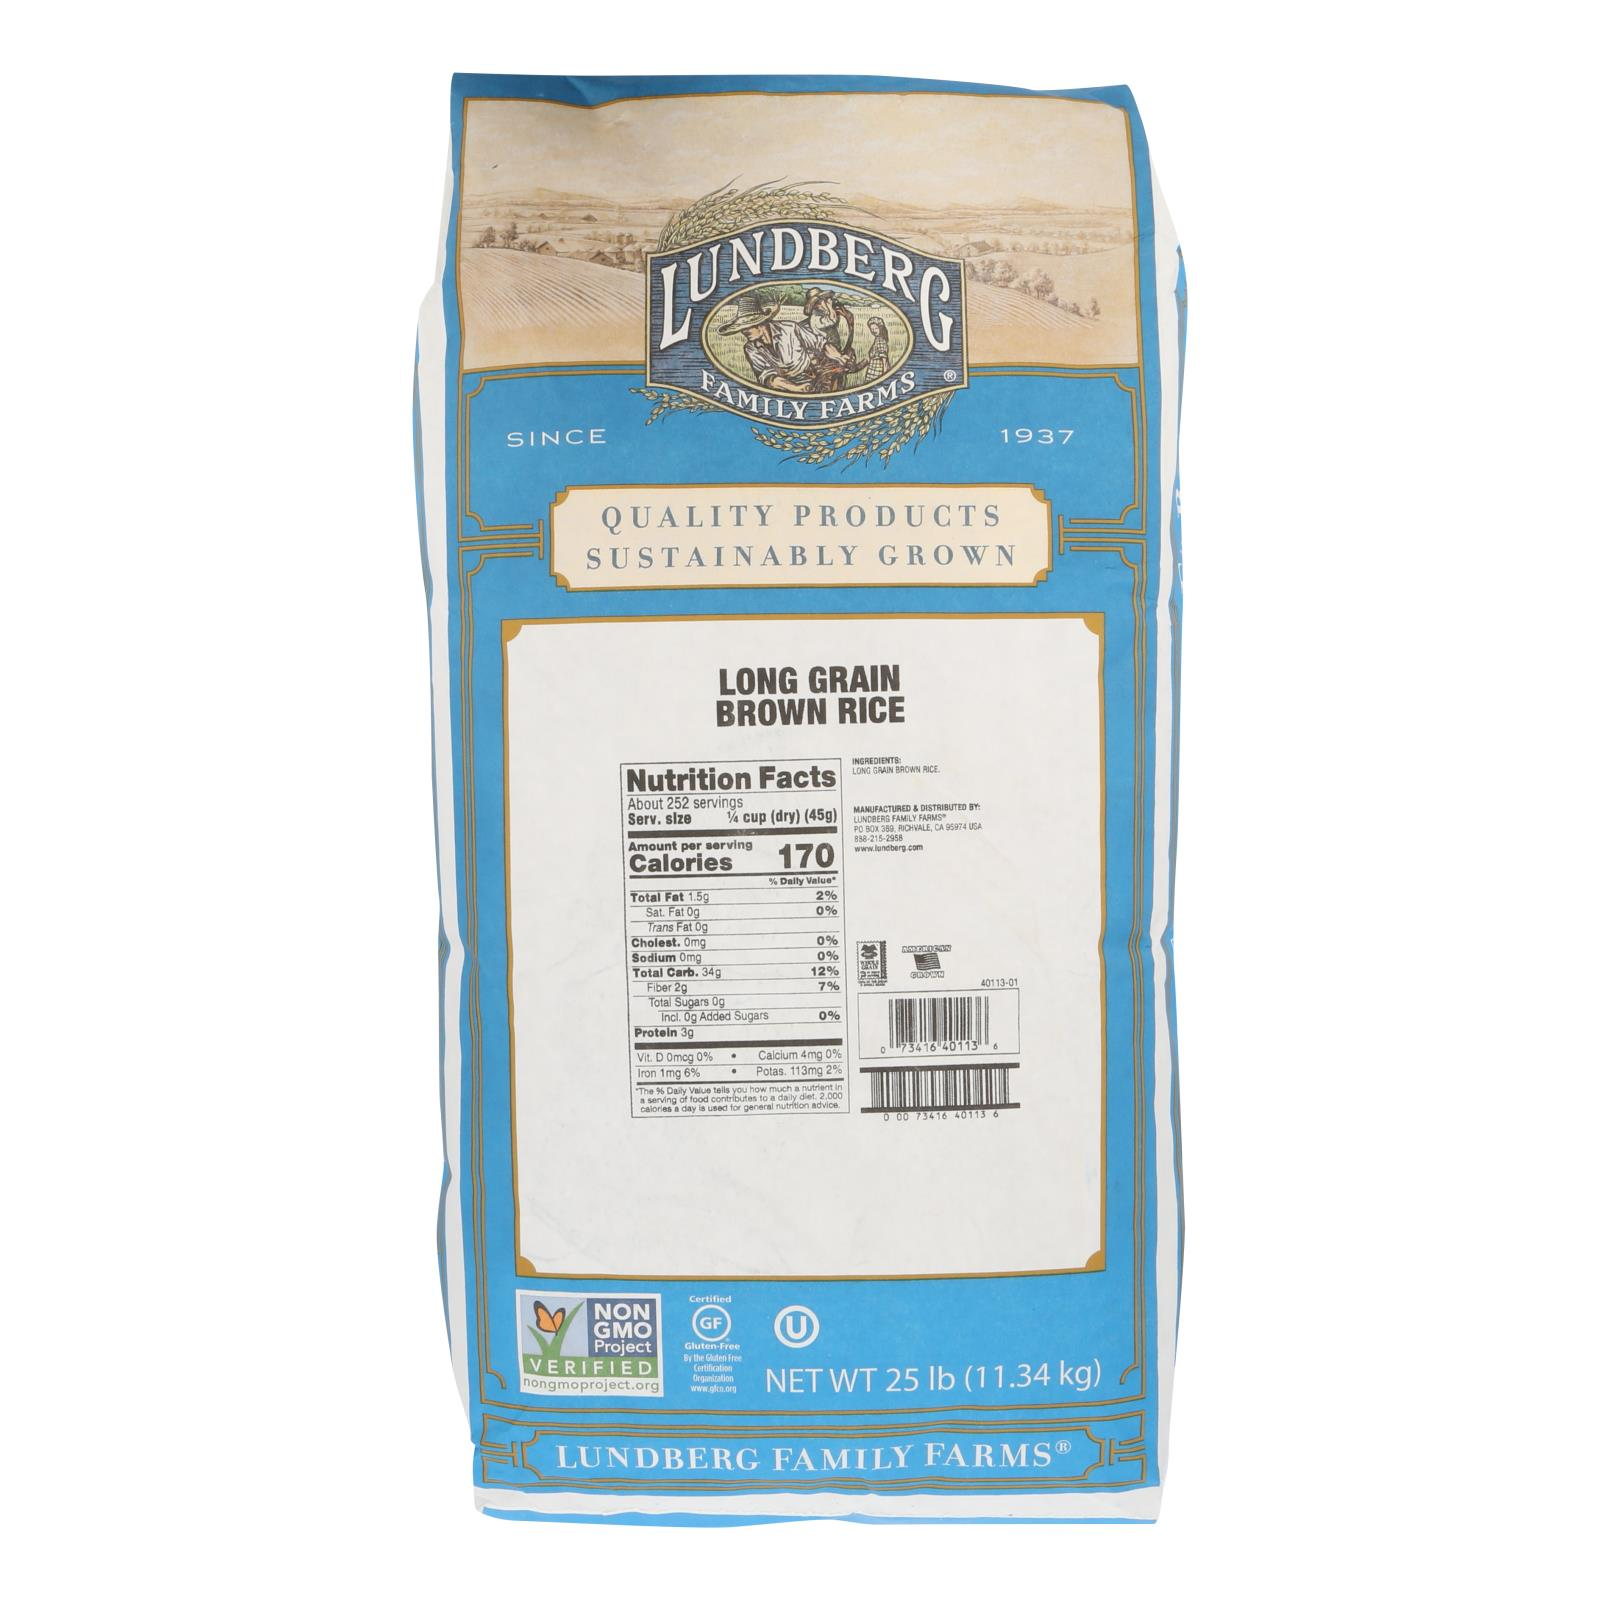 Lundberg Family Farms Eco - Farmed Long Grain Brown Rice - Case of 25 lbs